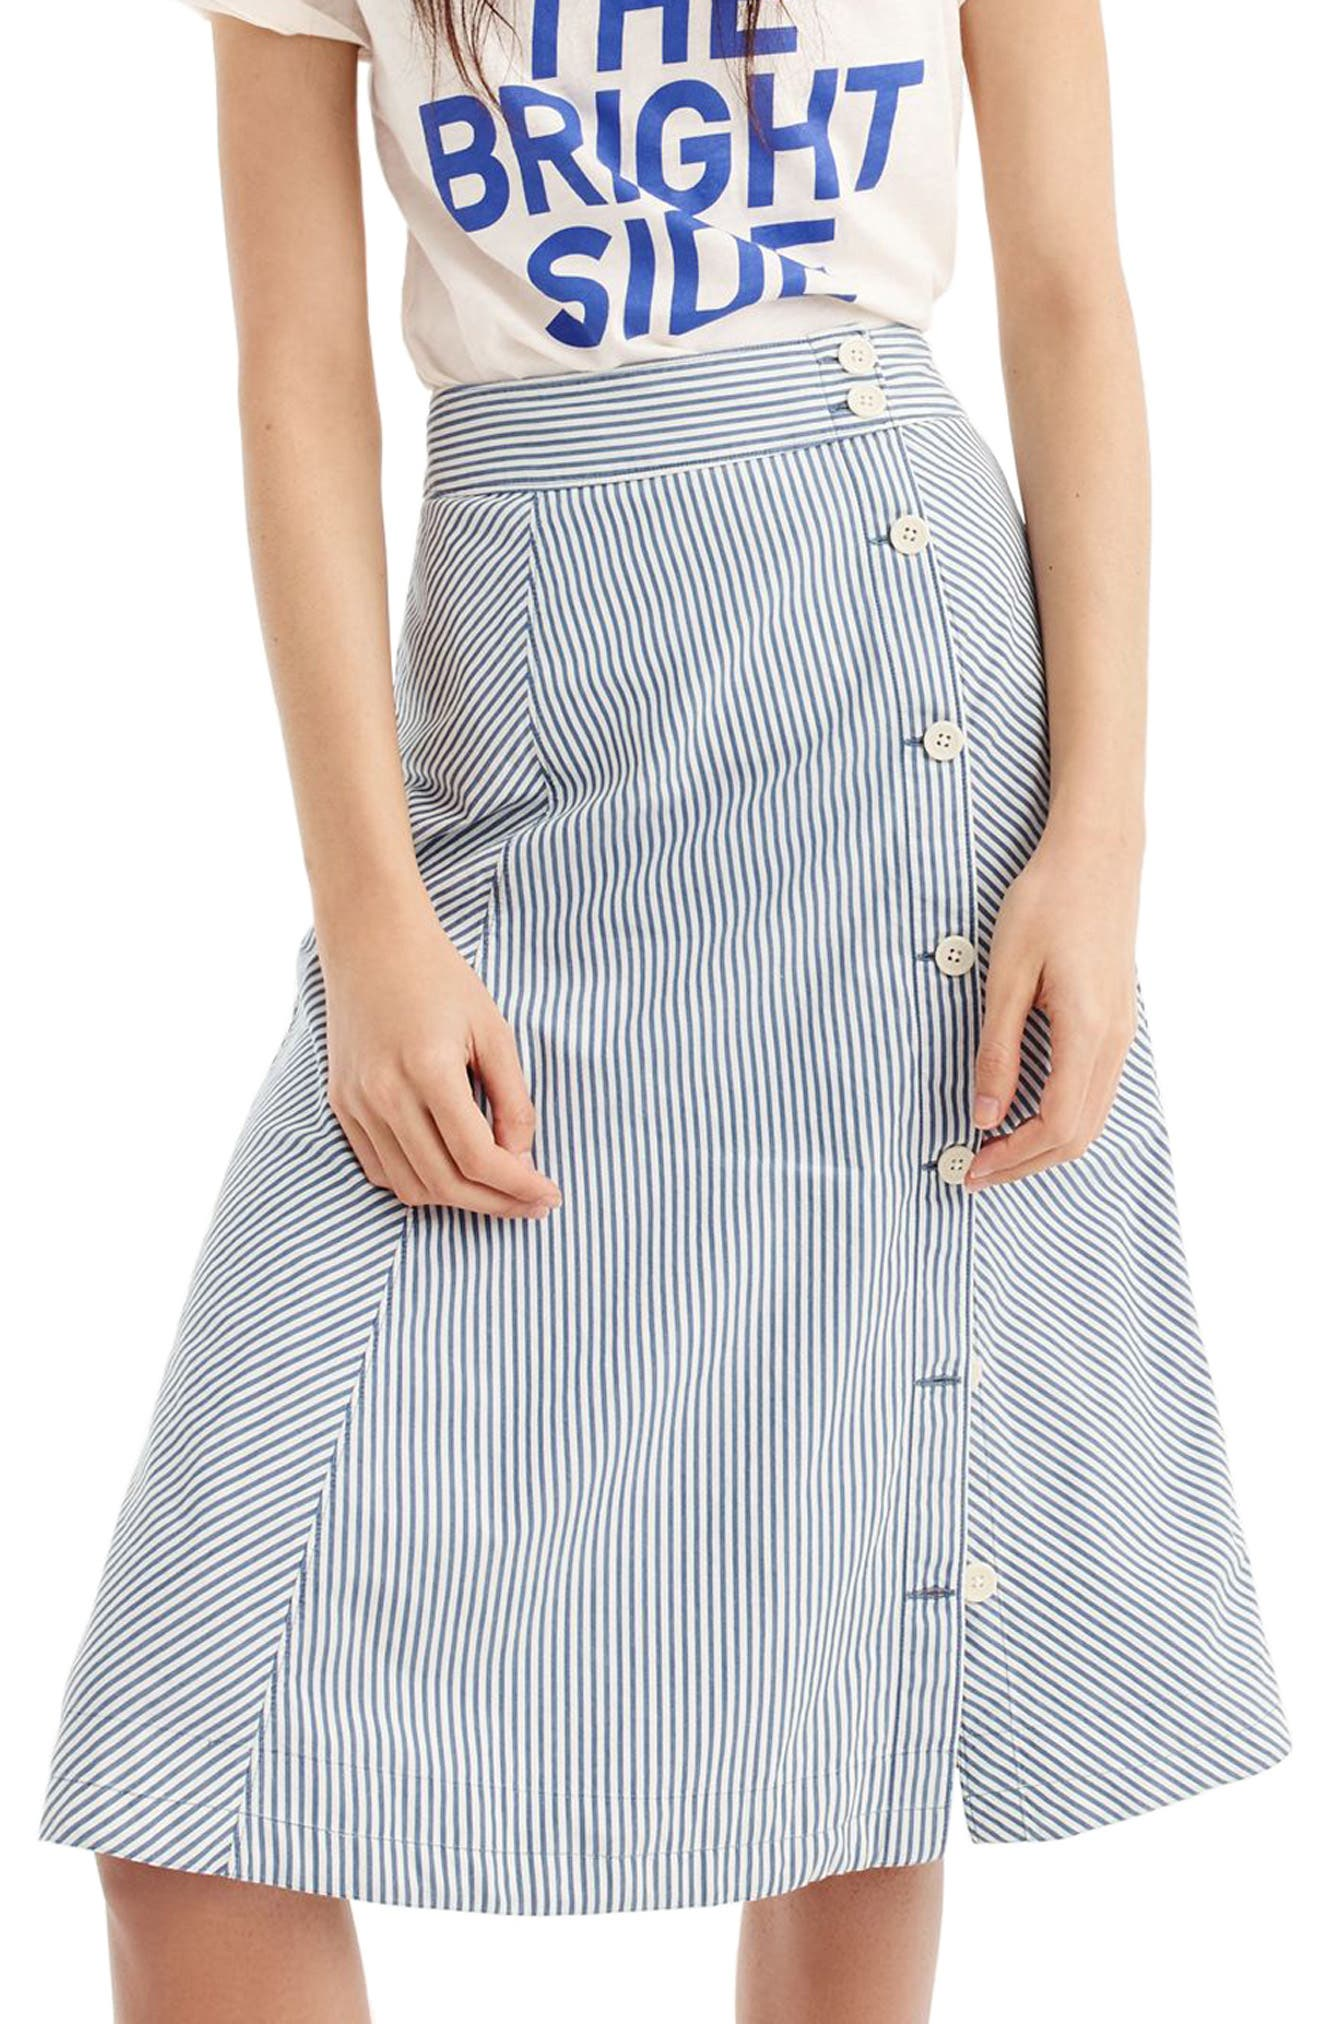 J.Crew Side Button Stripe Skirt,                         Main,                         color, Denim Side Button Skirt Stripe